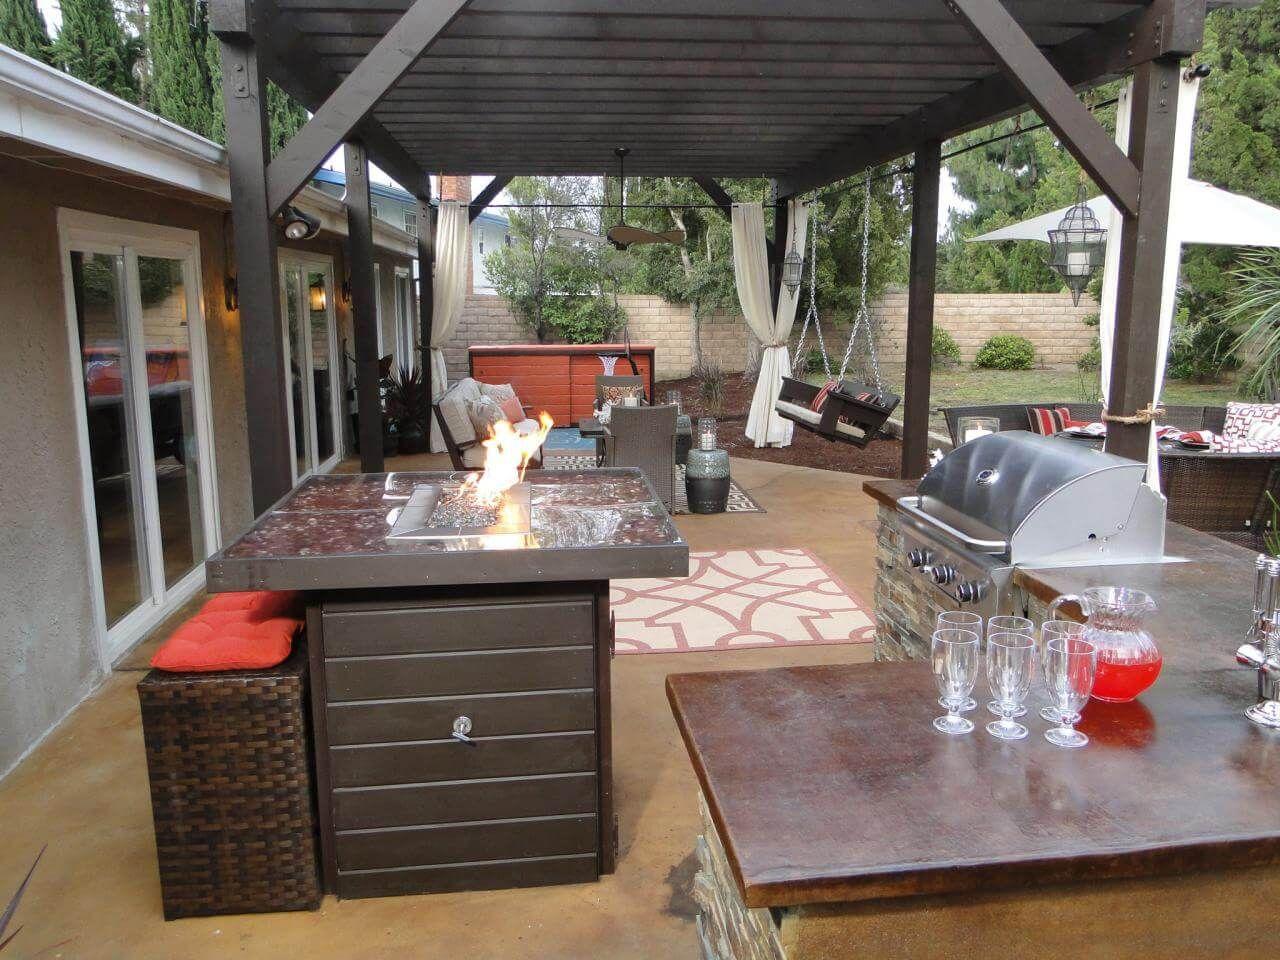 10 Outdoor Kitchen Island Ideas 2020 The Add On In 2020 Outdoor Kitchen Outdoor Kitchen Design Outdoor Kitchen Island